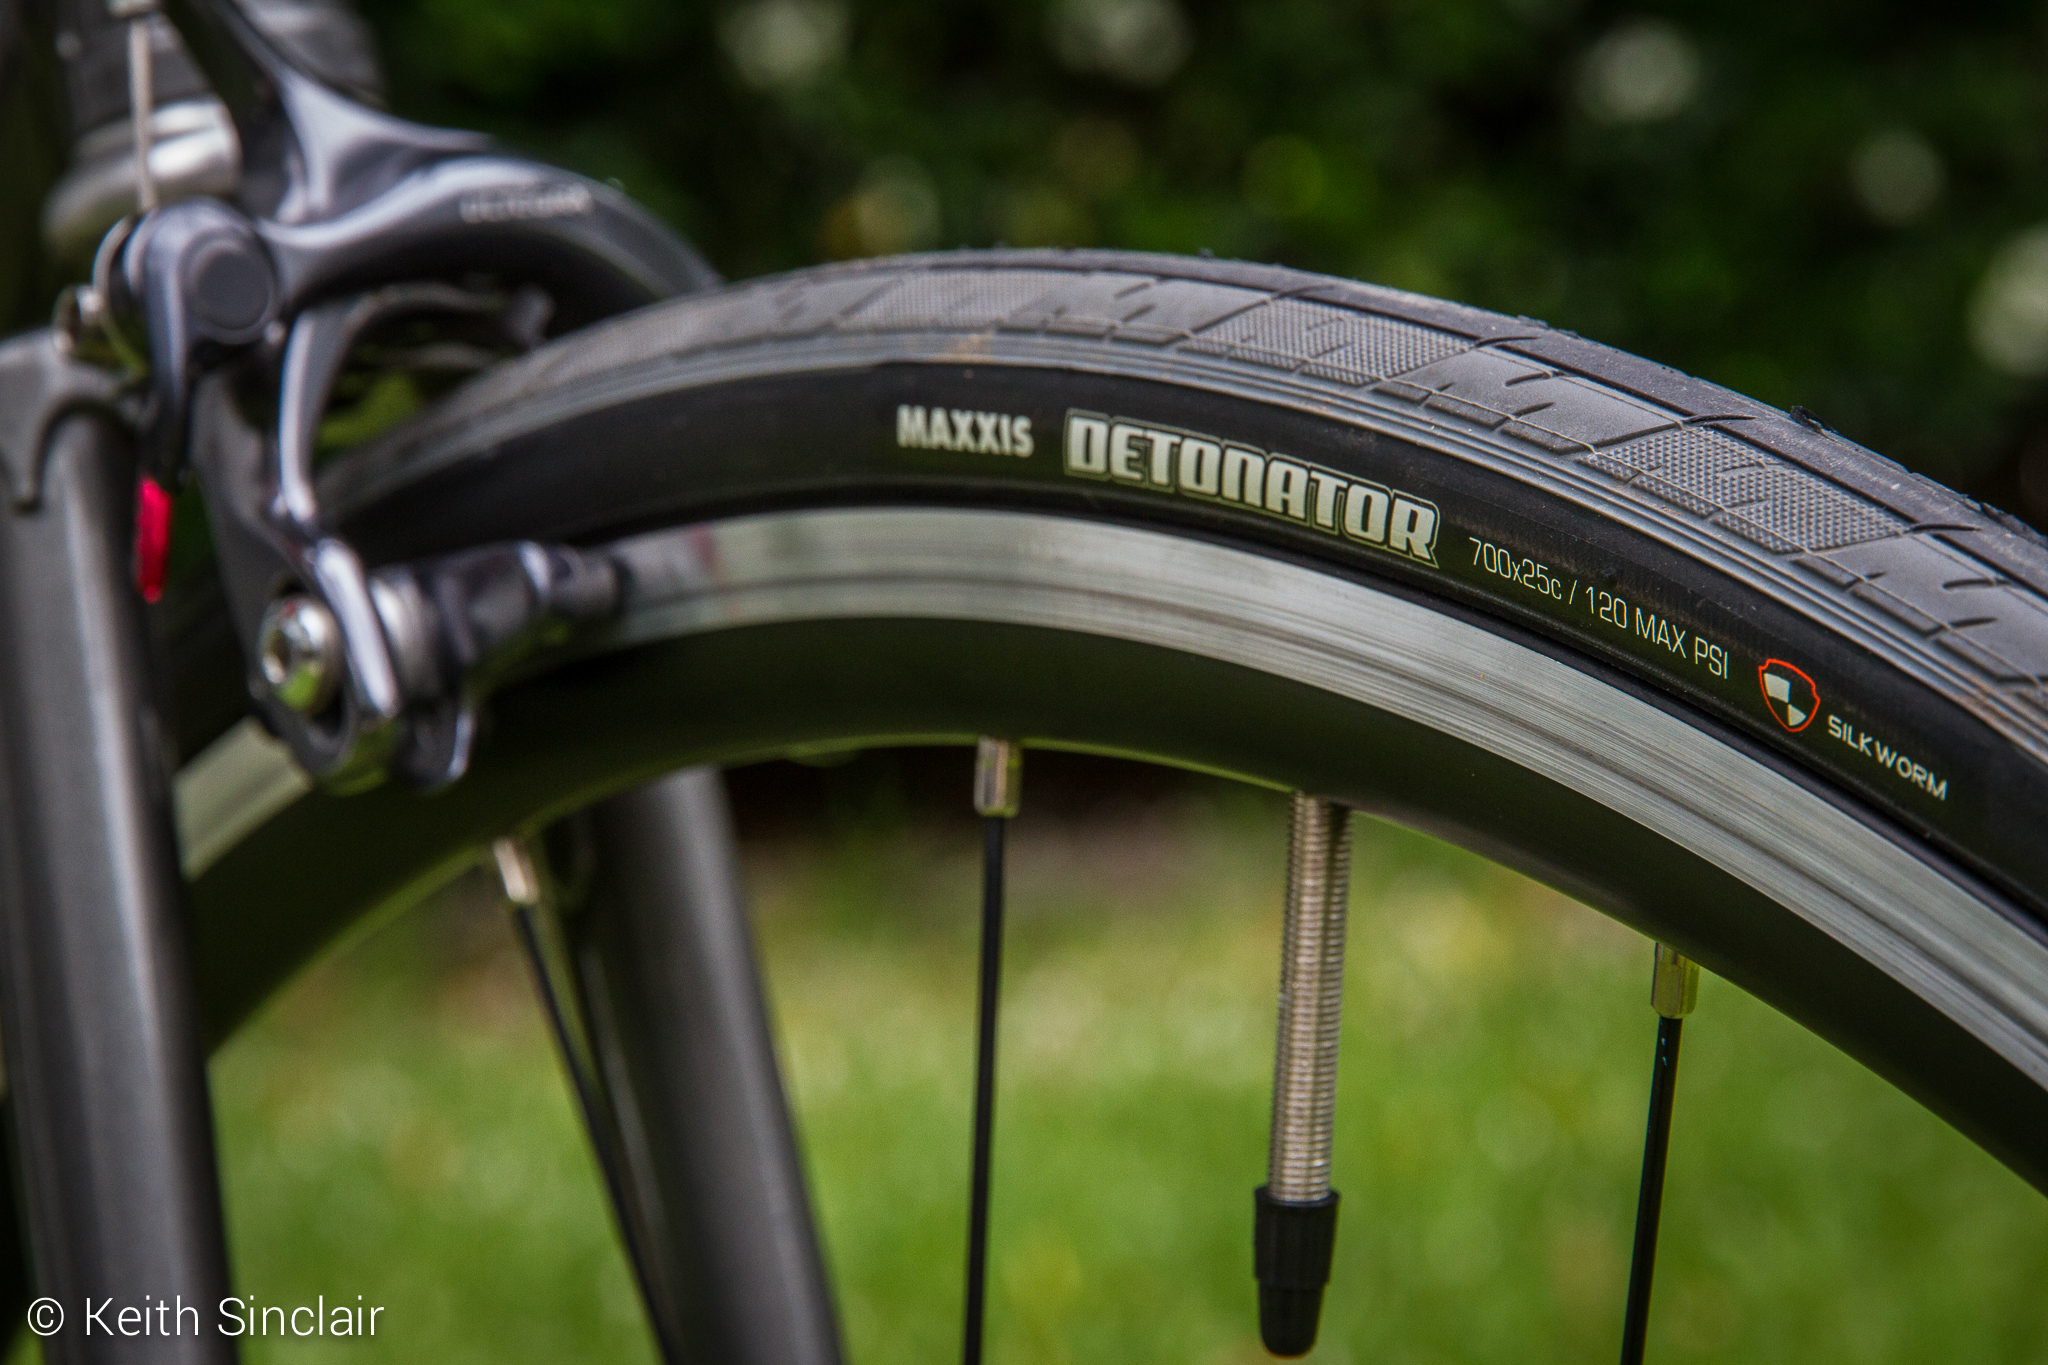 Maxxis Detonator 700 x 25c Tyres